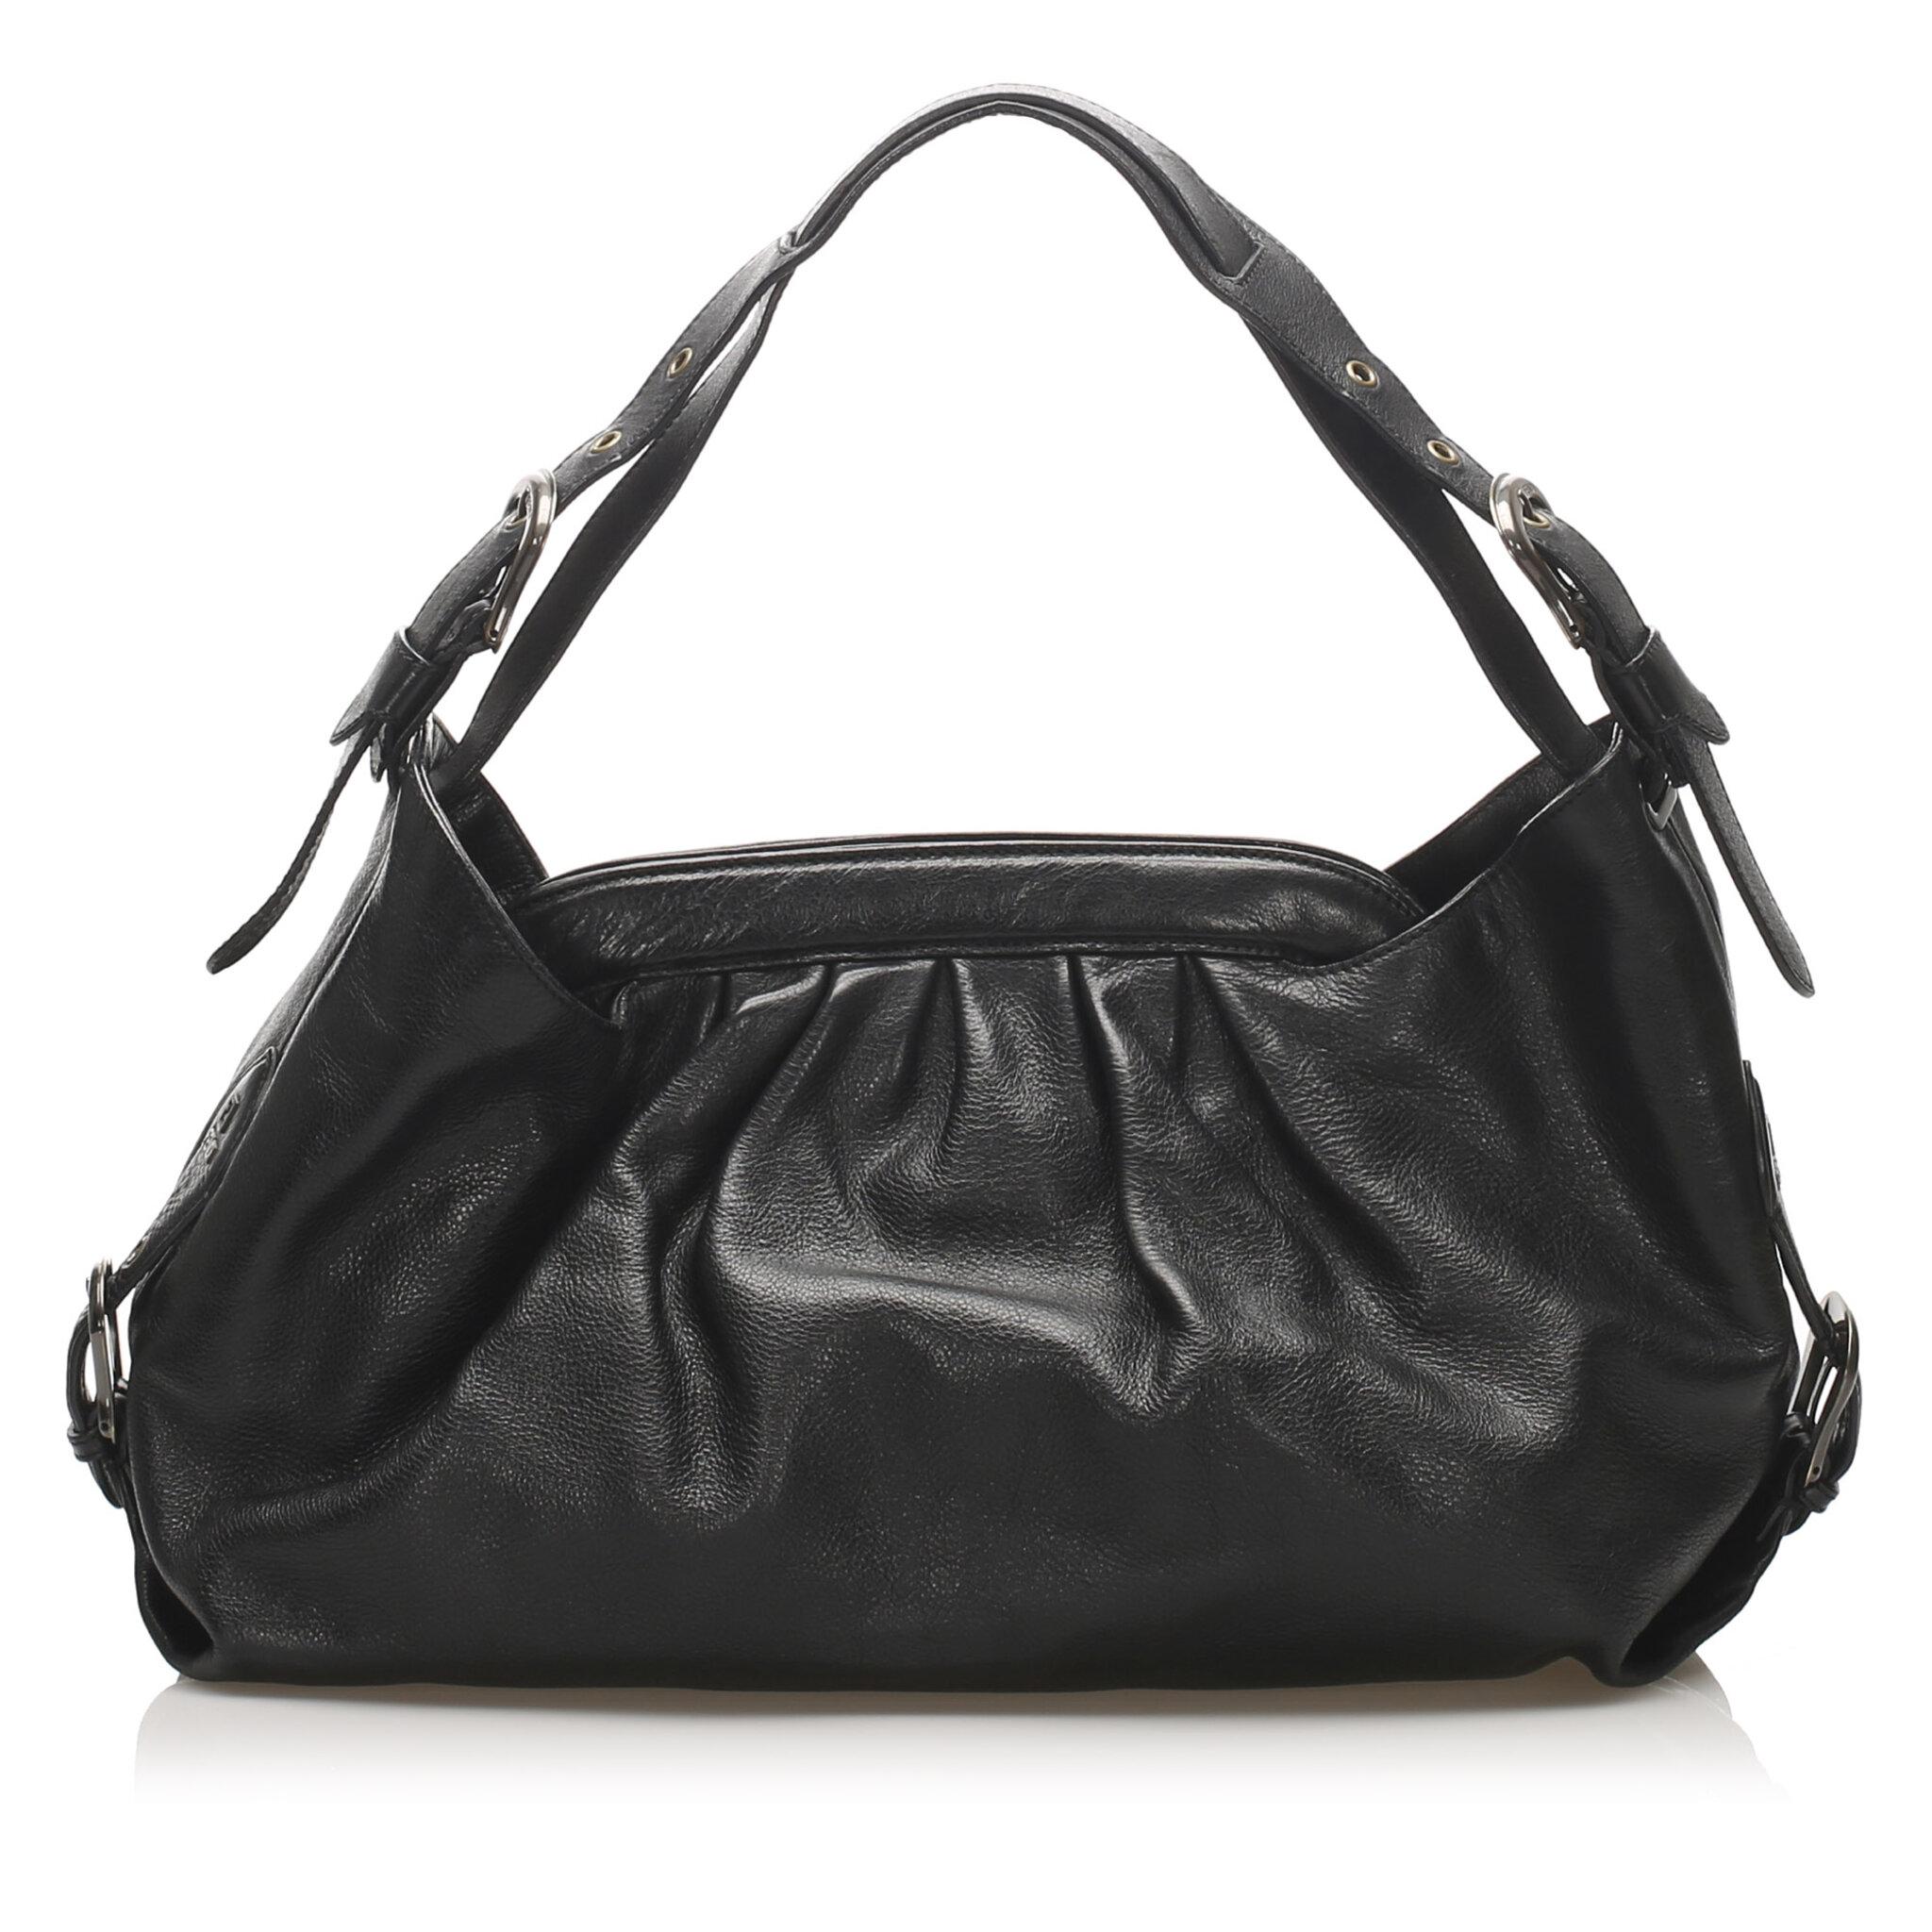 Fendi Doctor B Leather Handbag